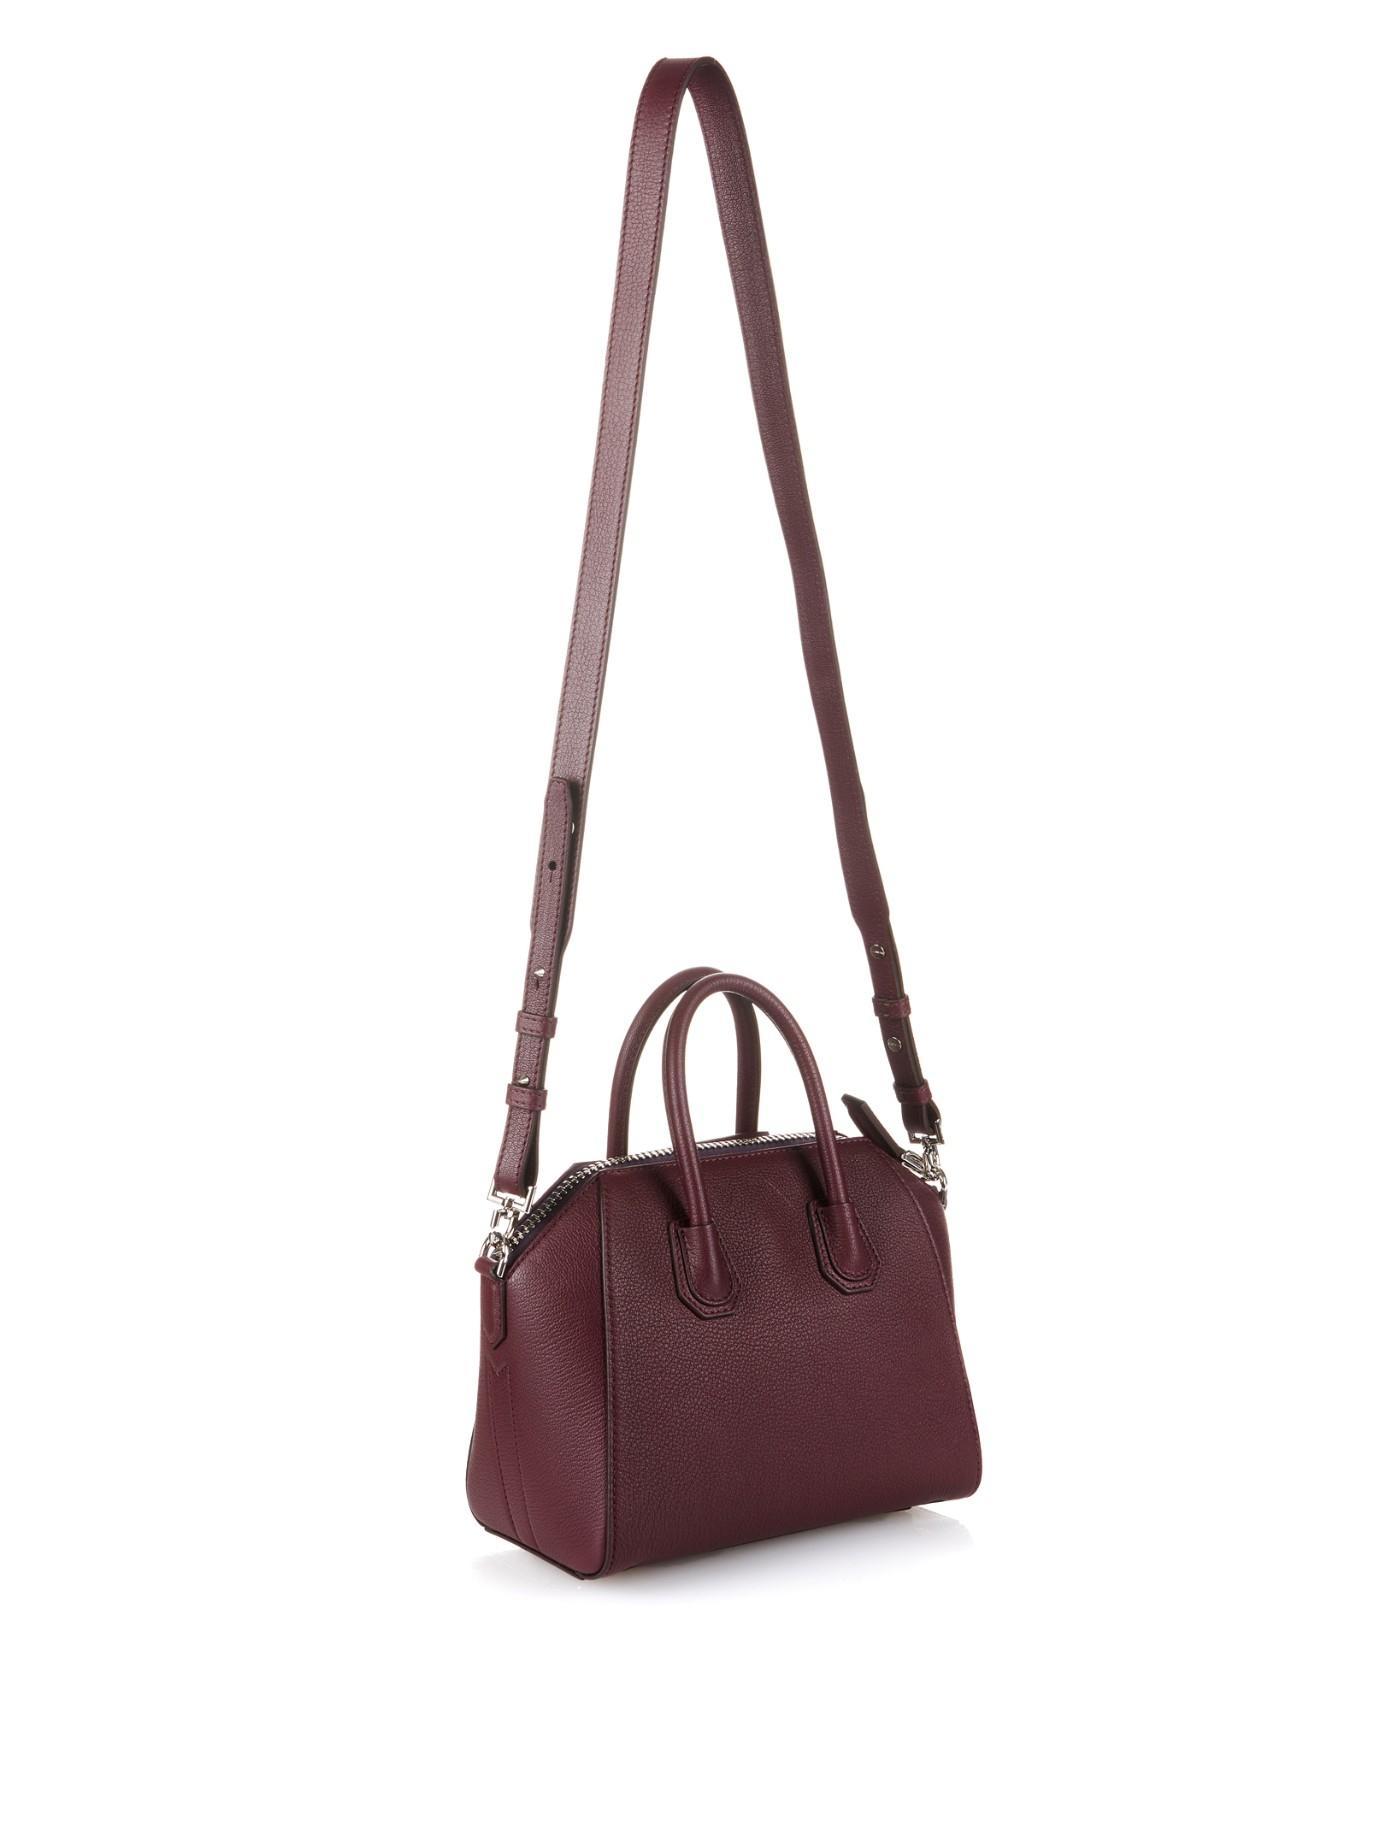 dbccaf6cca Givenchy Antigona Mini Leather Cross-Body Bag in Purple - Lyst